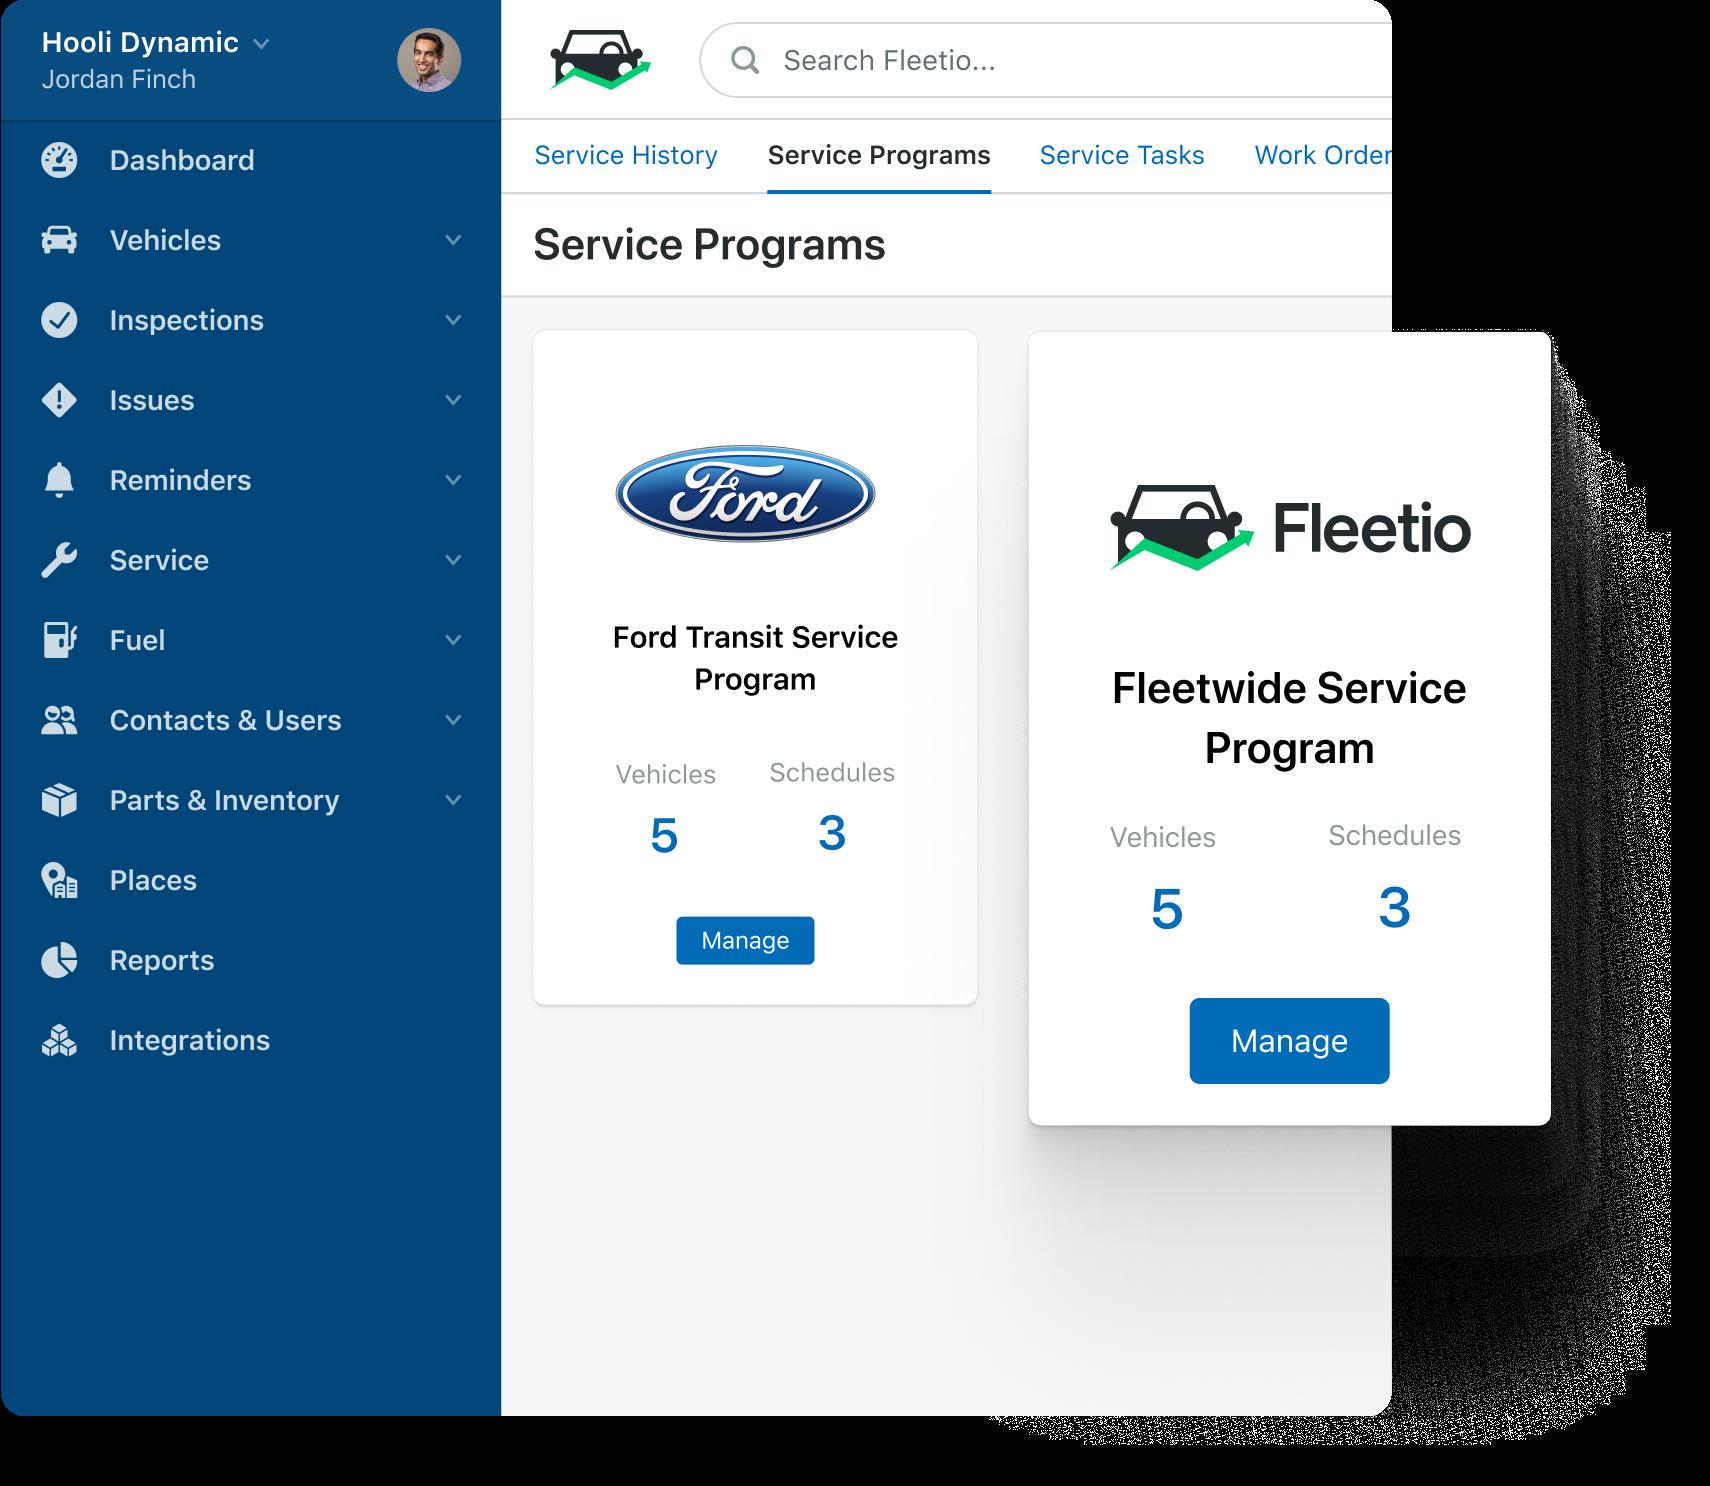 service programs visual